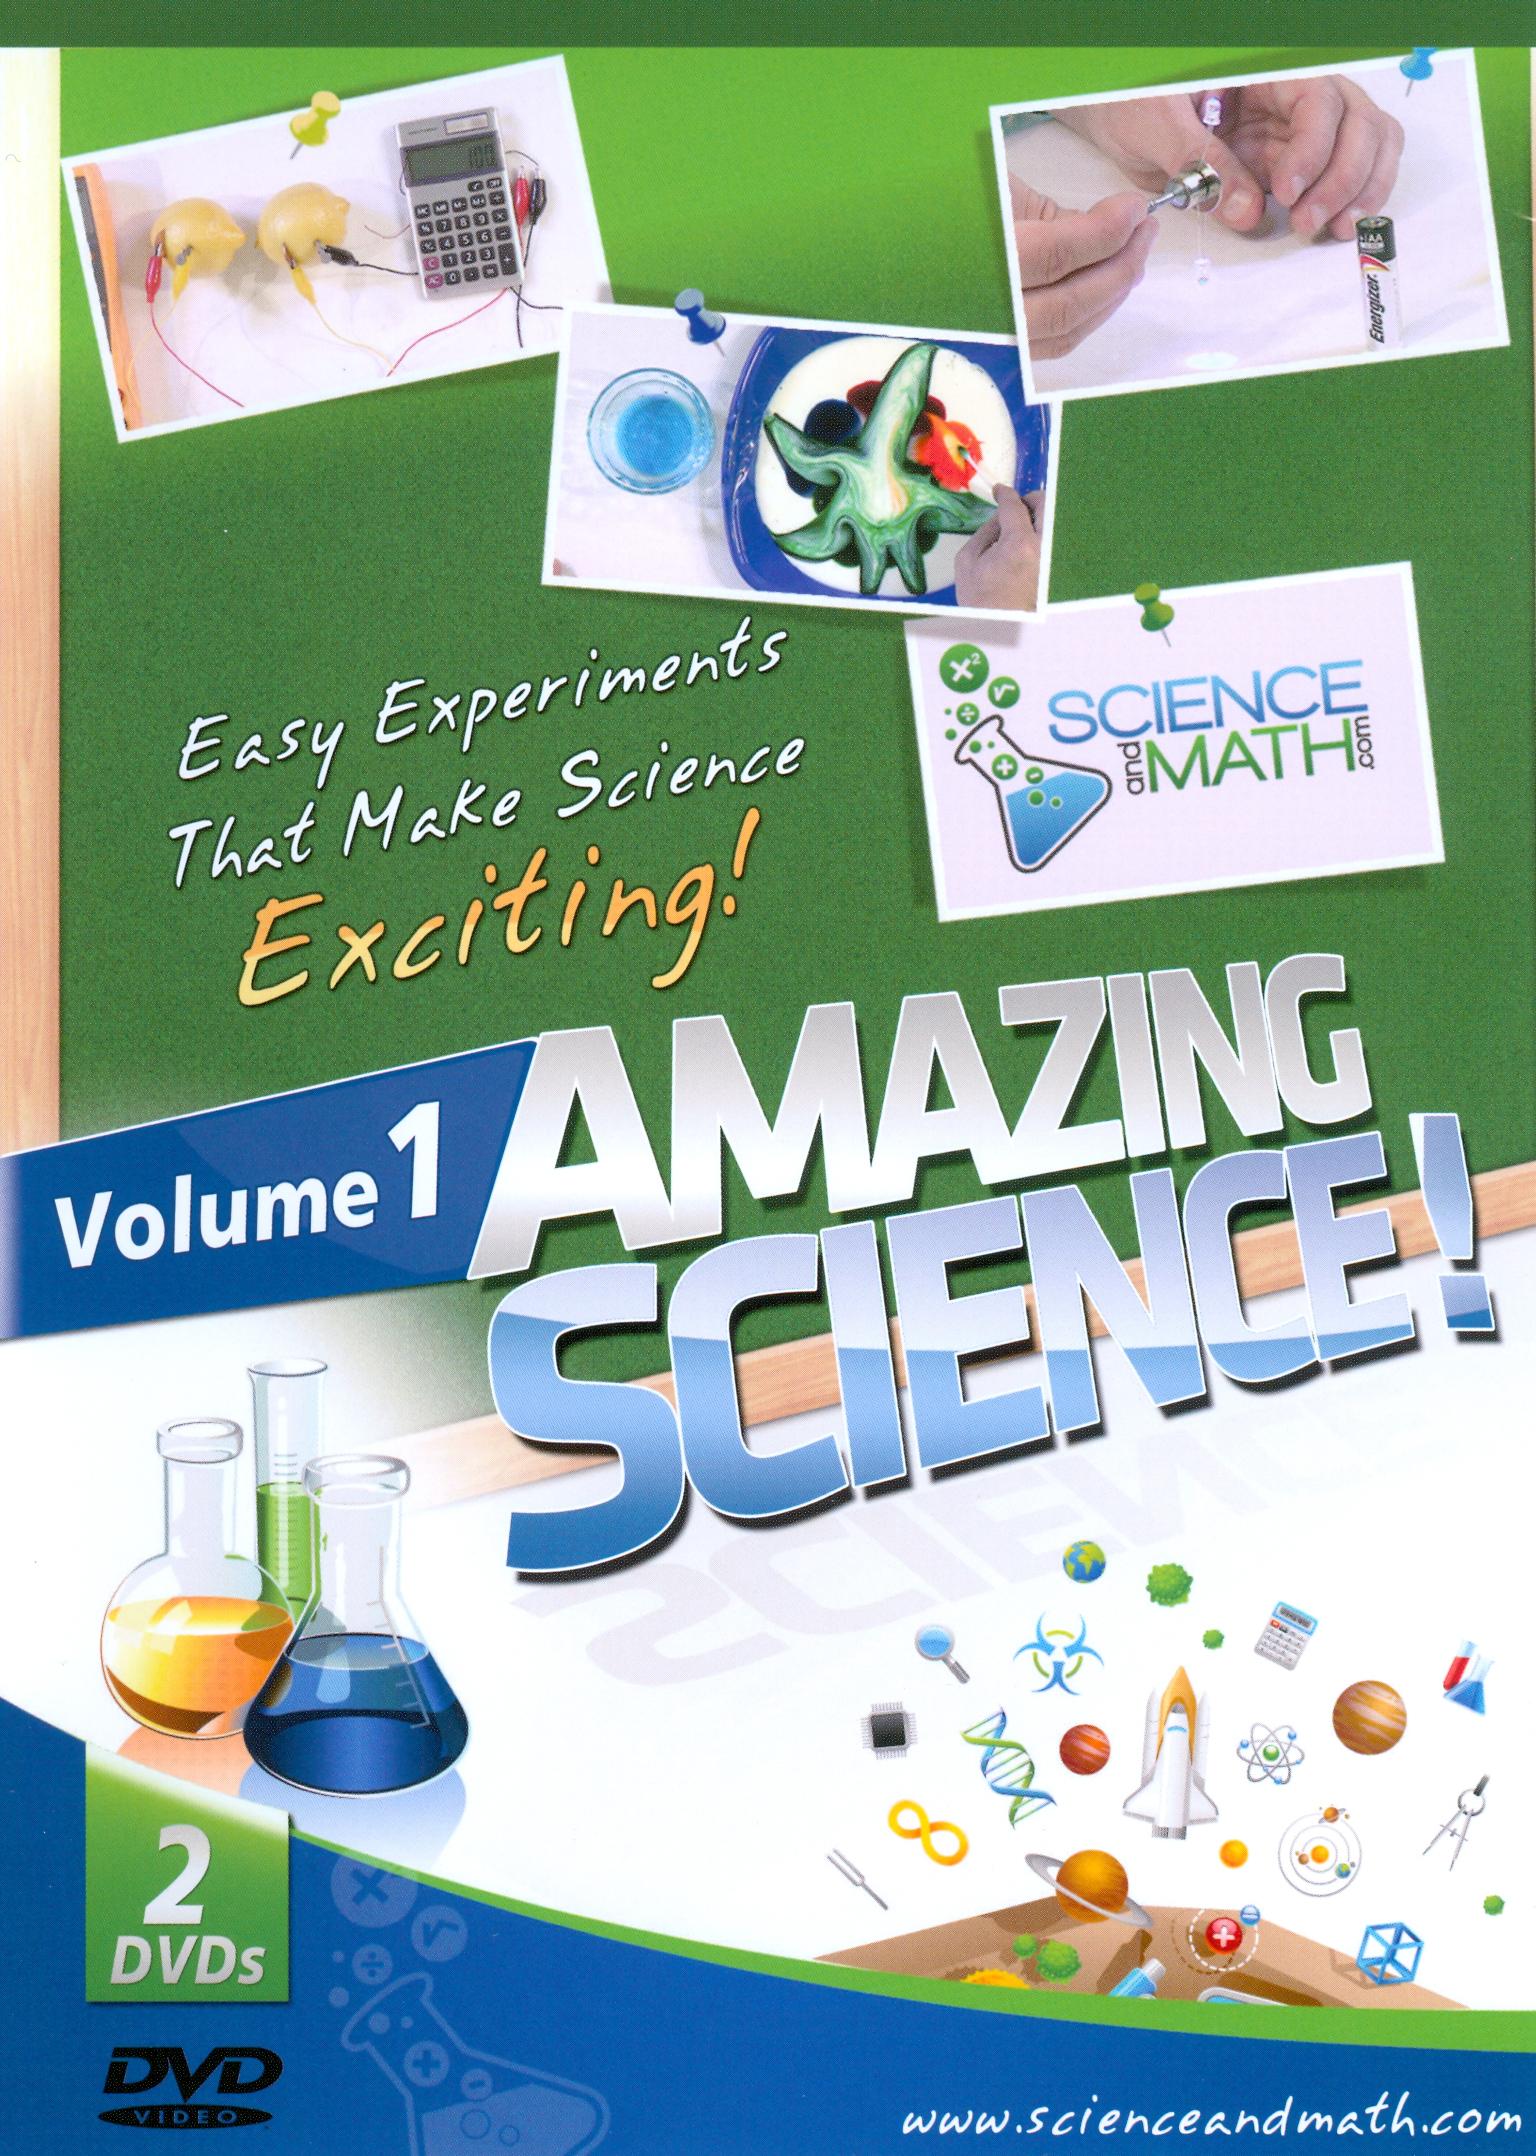 Amazing Science!, Vol. 1